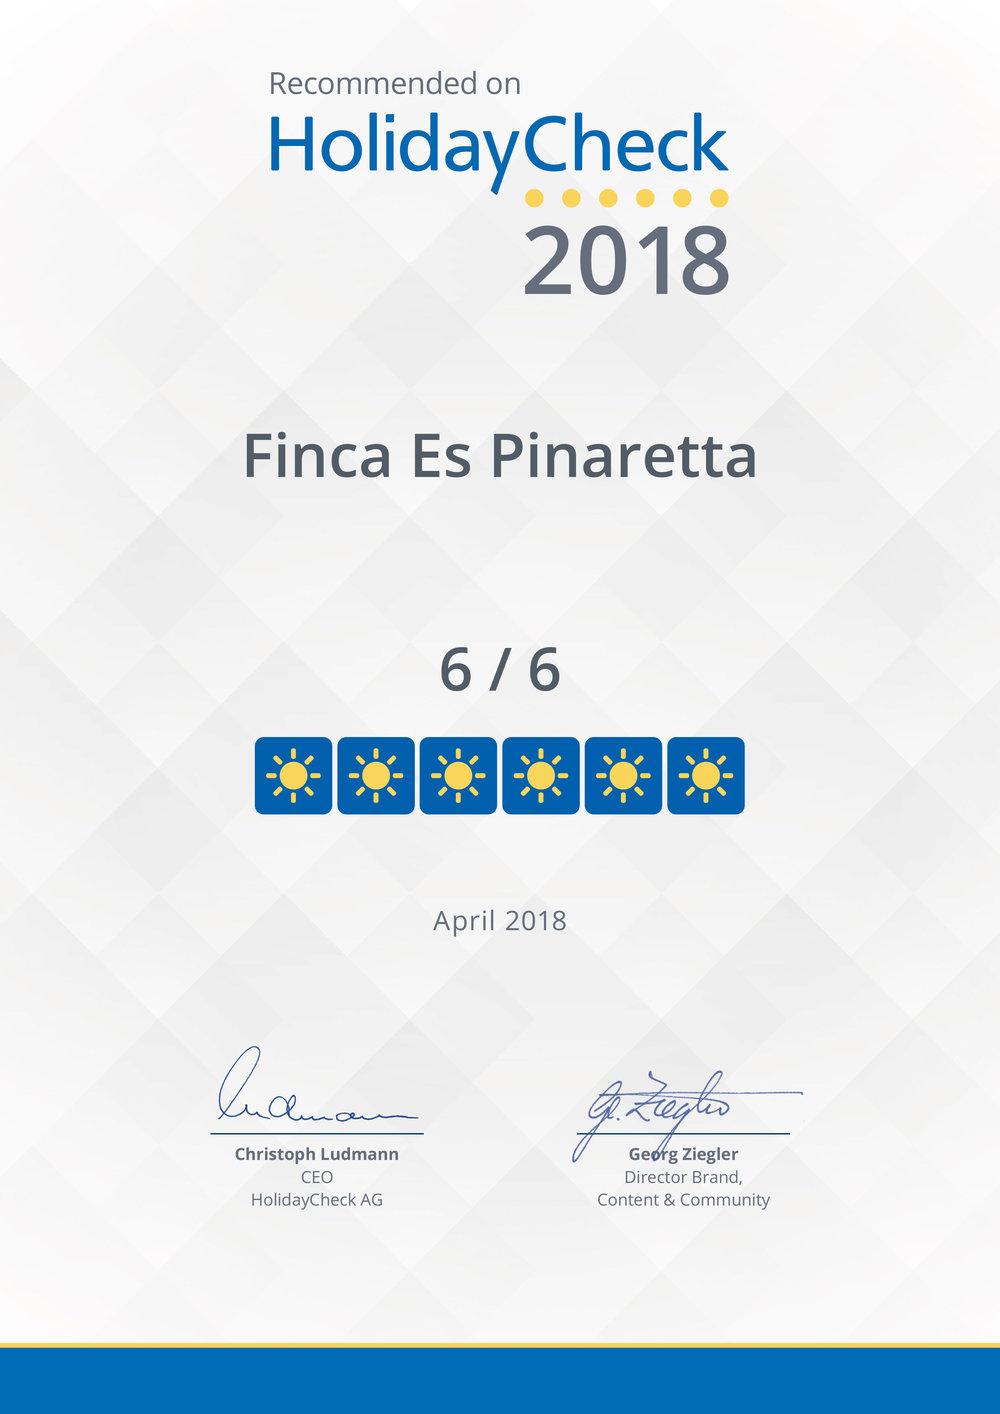 Finca-Es-Pinaretta.jpg